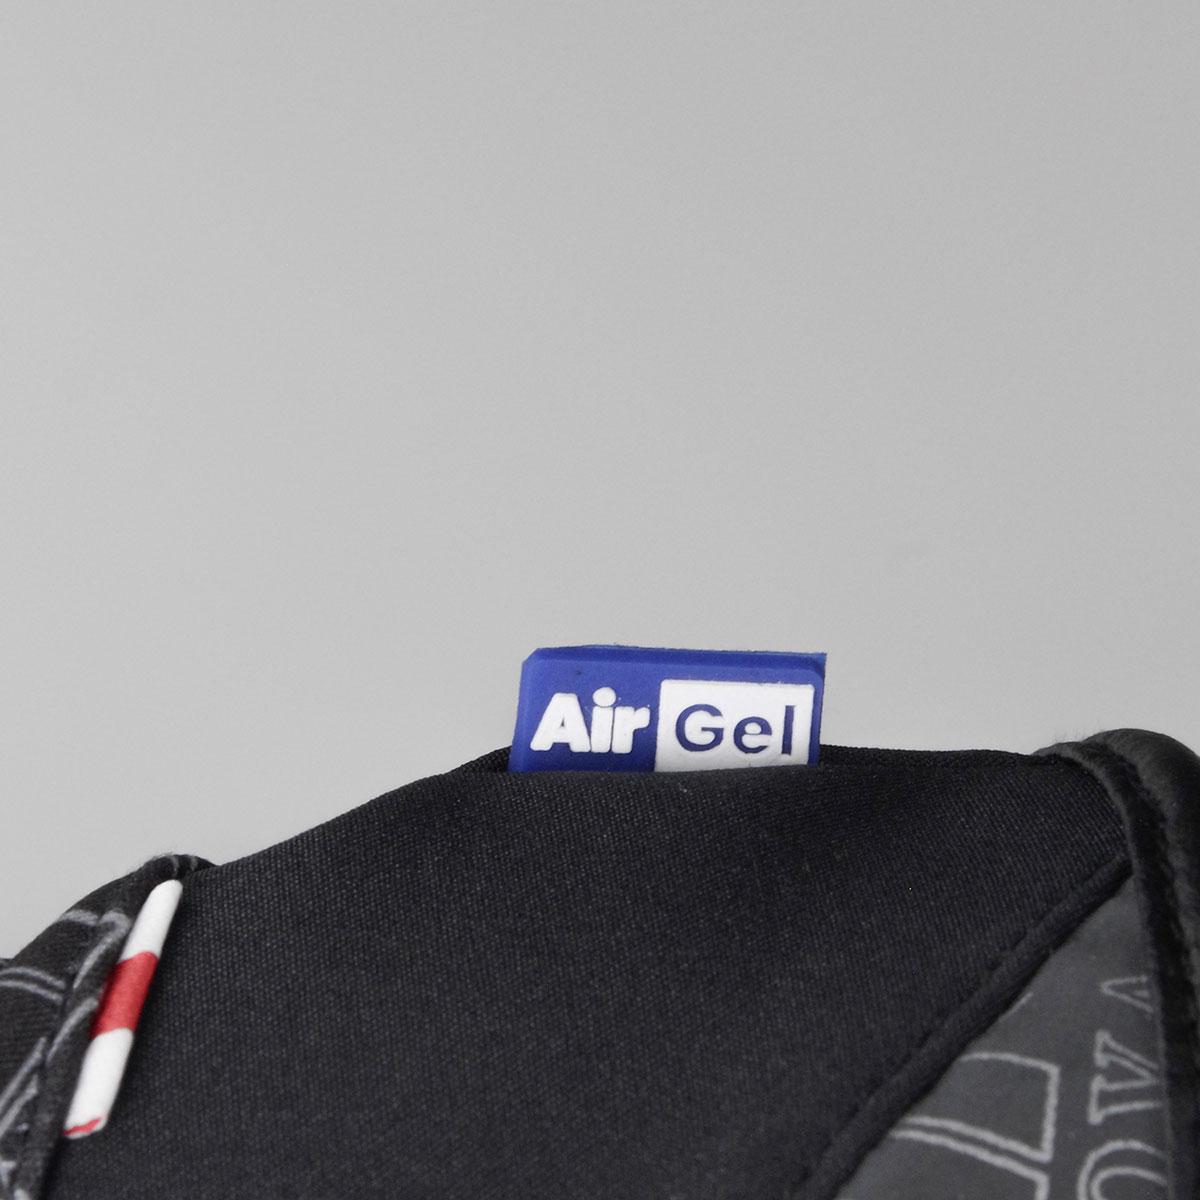 GK-830 AIR GEL ウィンターグローブ